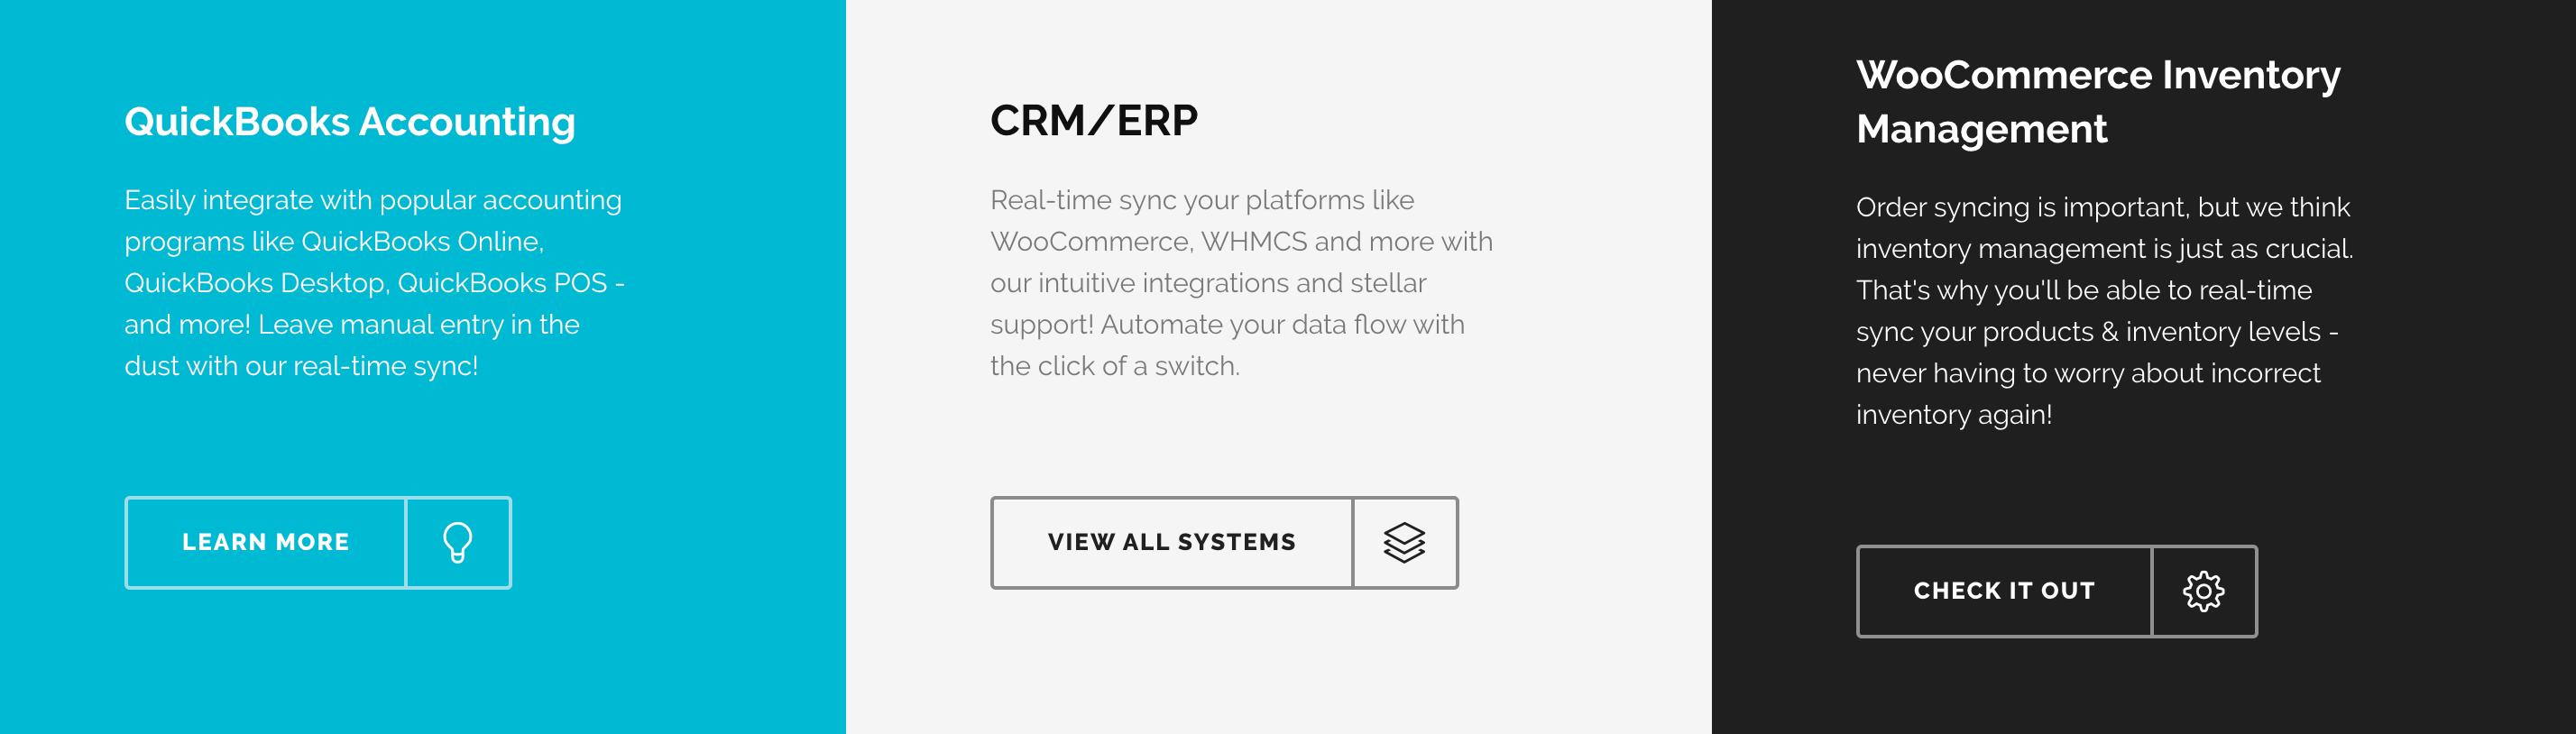 MyWorks WooCommerce Integrations